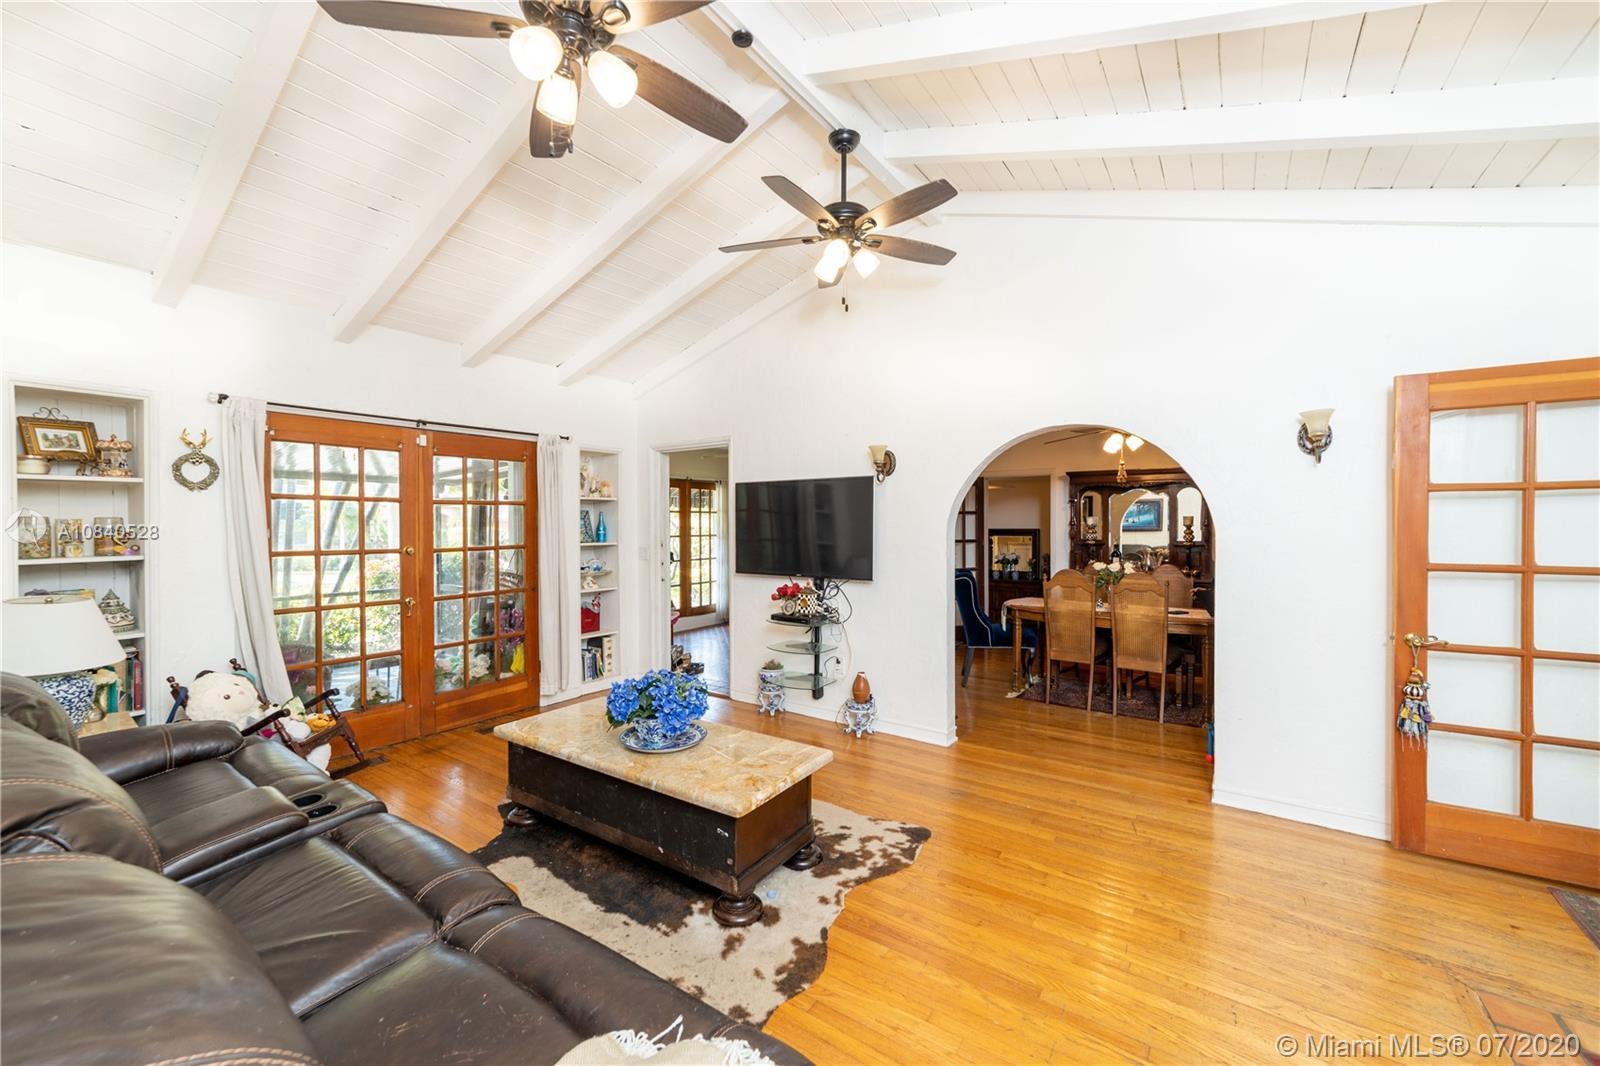 1635 Nethia Dr, Miami, Florida 33133, 3 Bedrooms Bedrooms, ,2 BathroomsBathrooms,Residential,For Sale,1635 Nethia Dr,A10840528